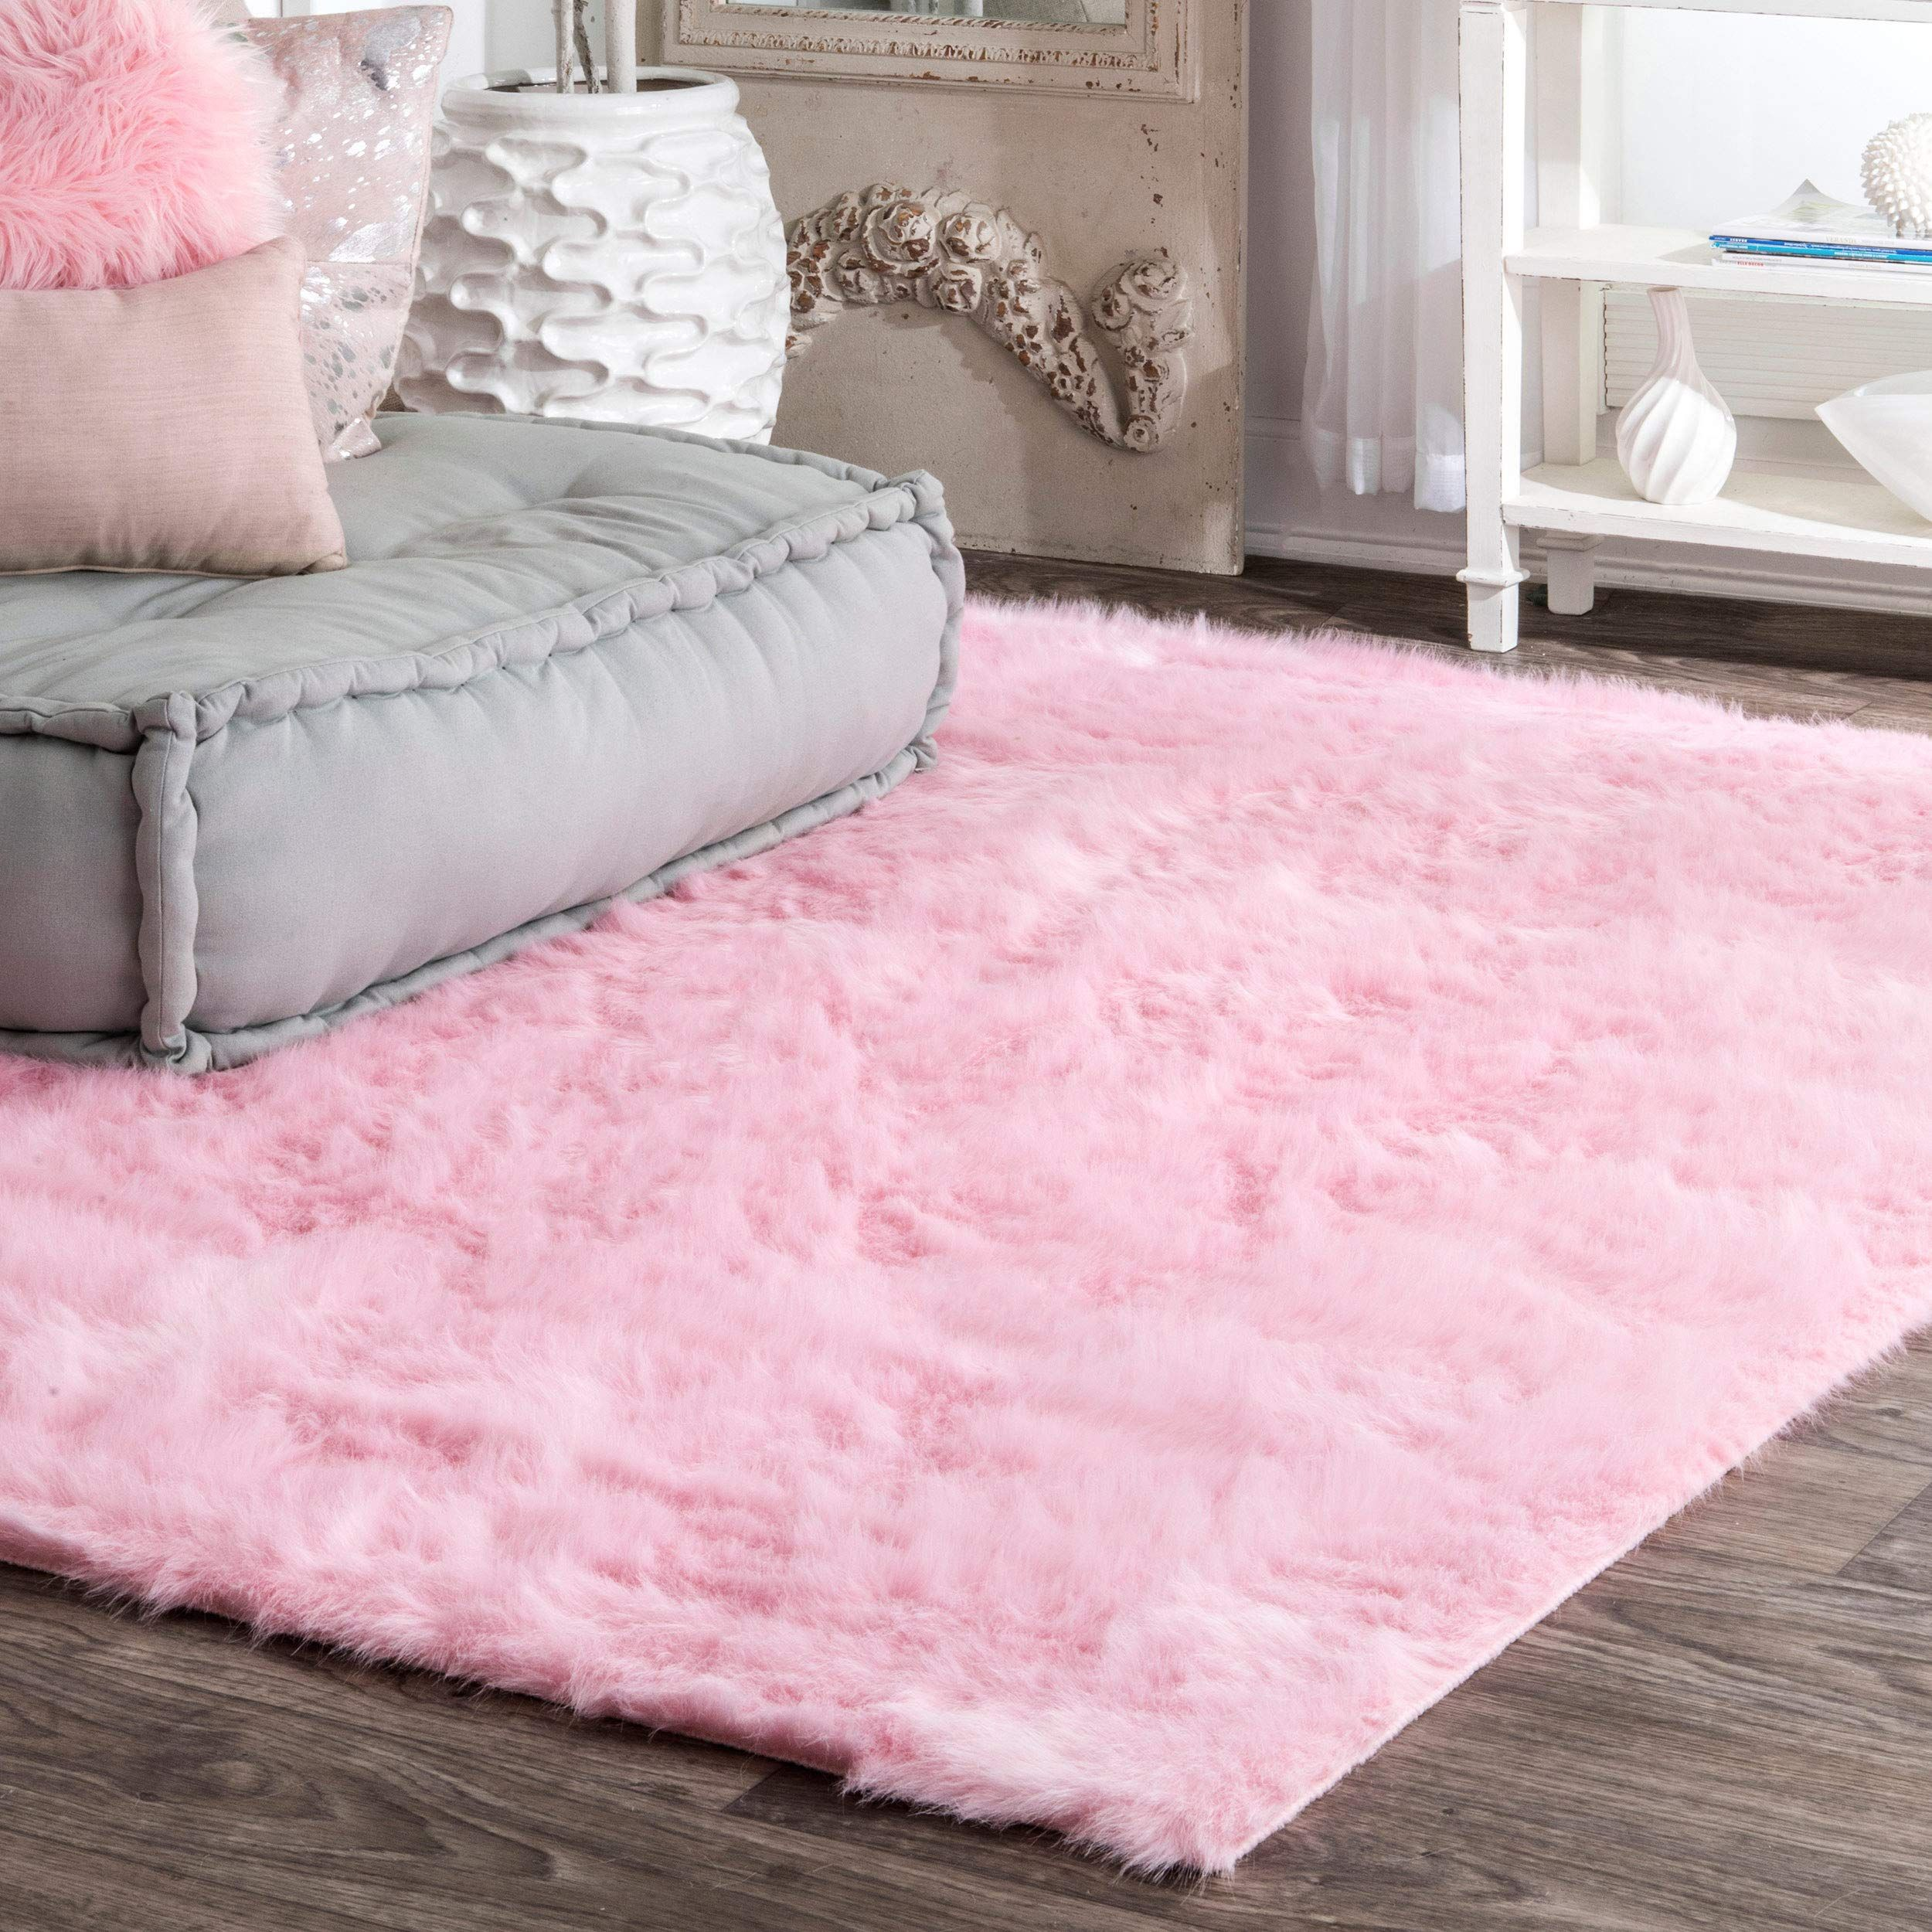 Nuloom Cloud Faux Sheepskin Soft Plush Shag Rug 3 X 5 Pink Lavorist Plush Carpet Pink Rug Bedroom Flooring #soft #plush #area #rugs #for #living #room